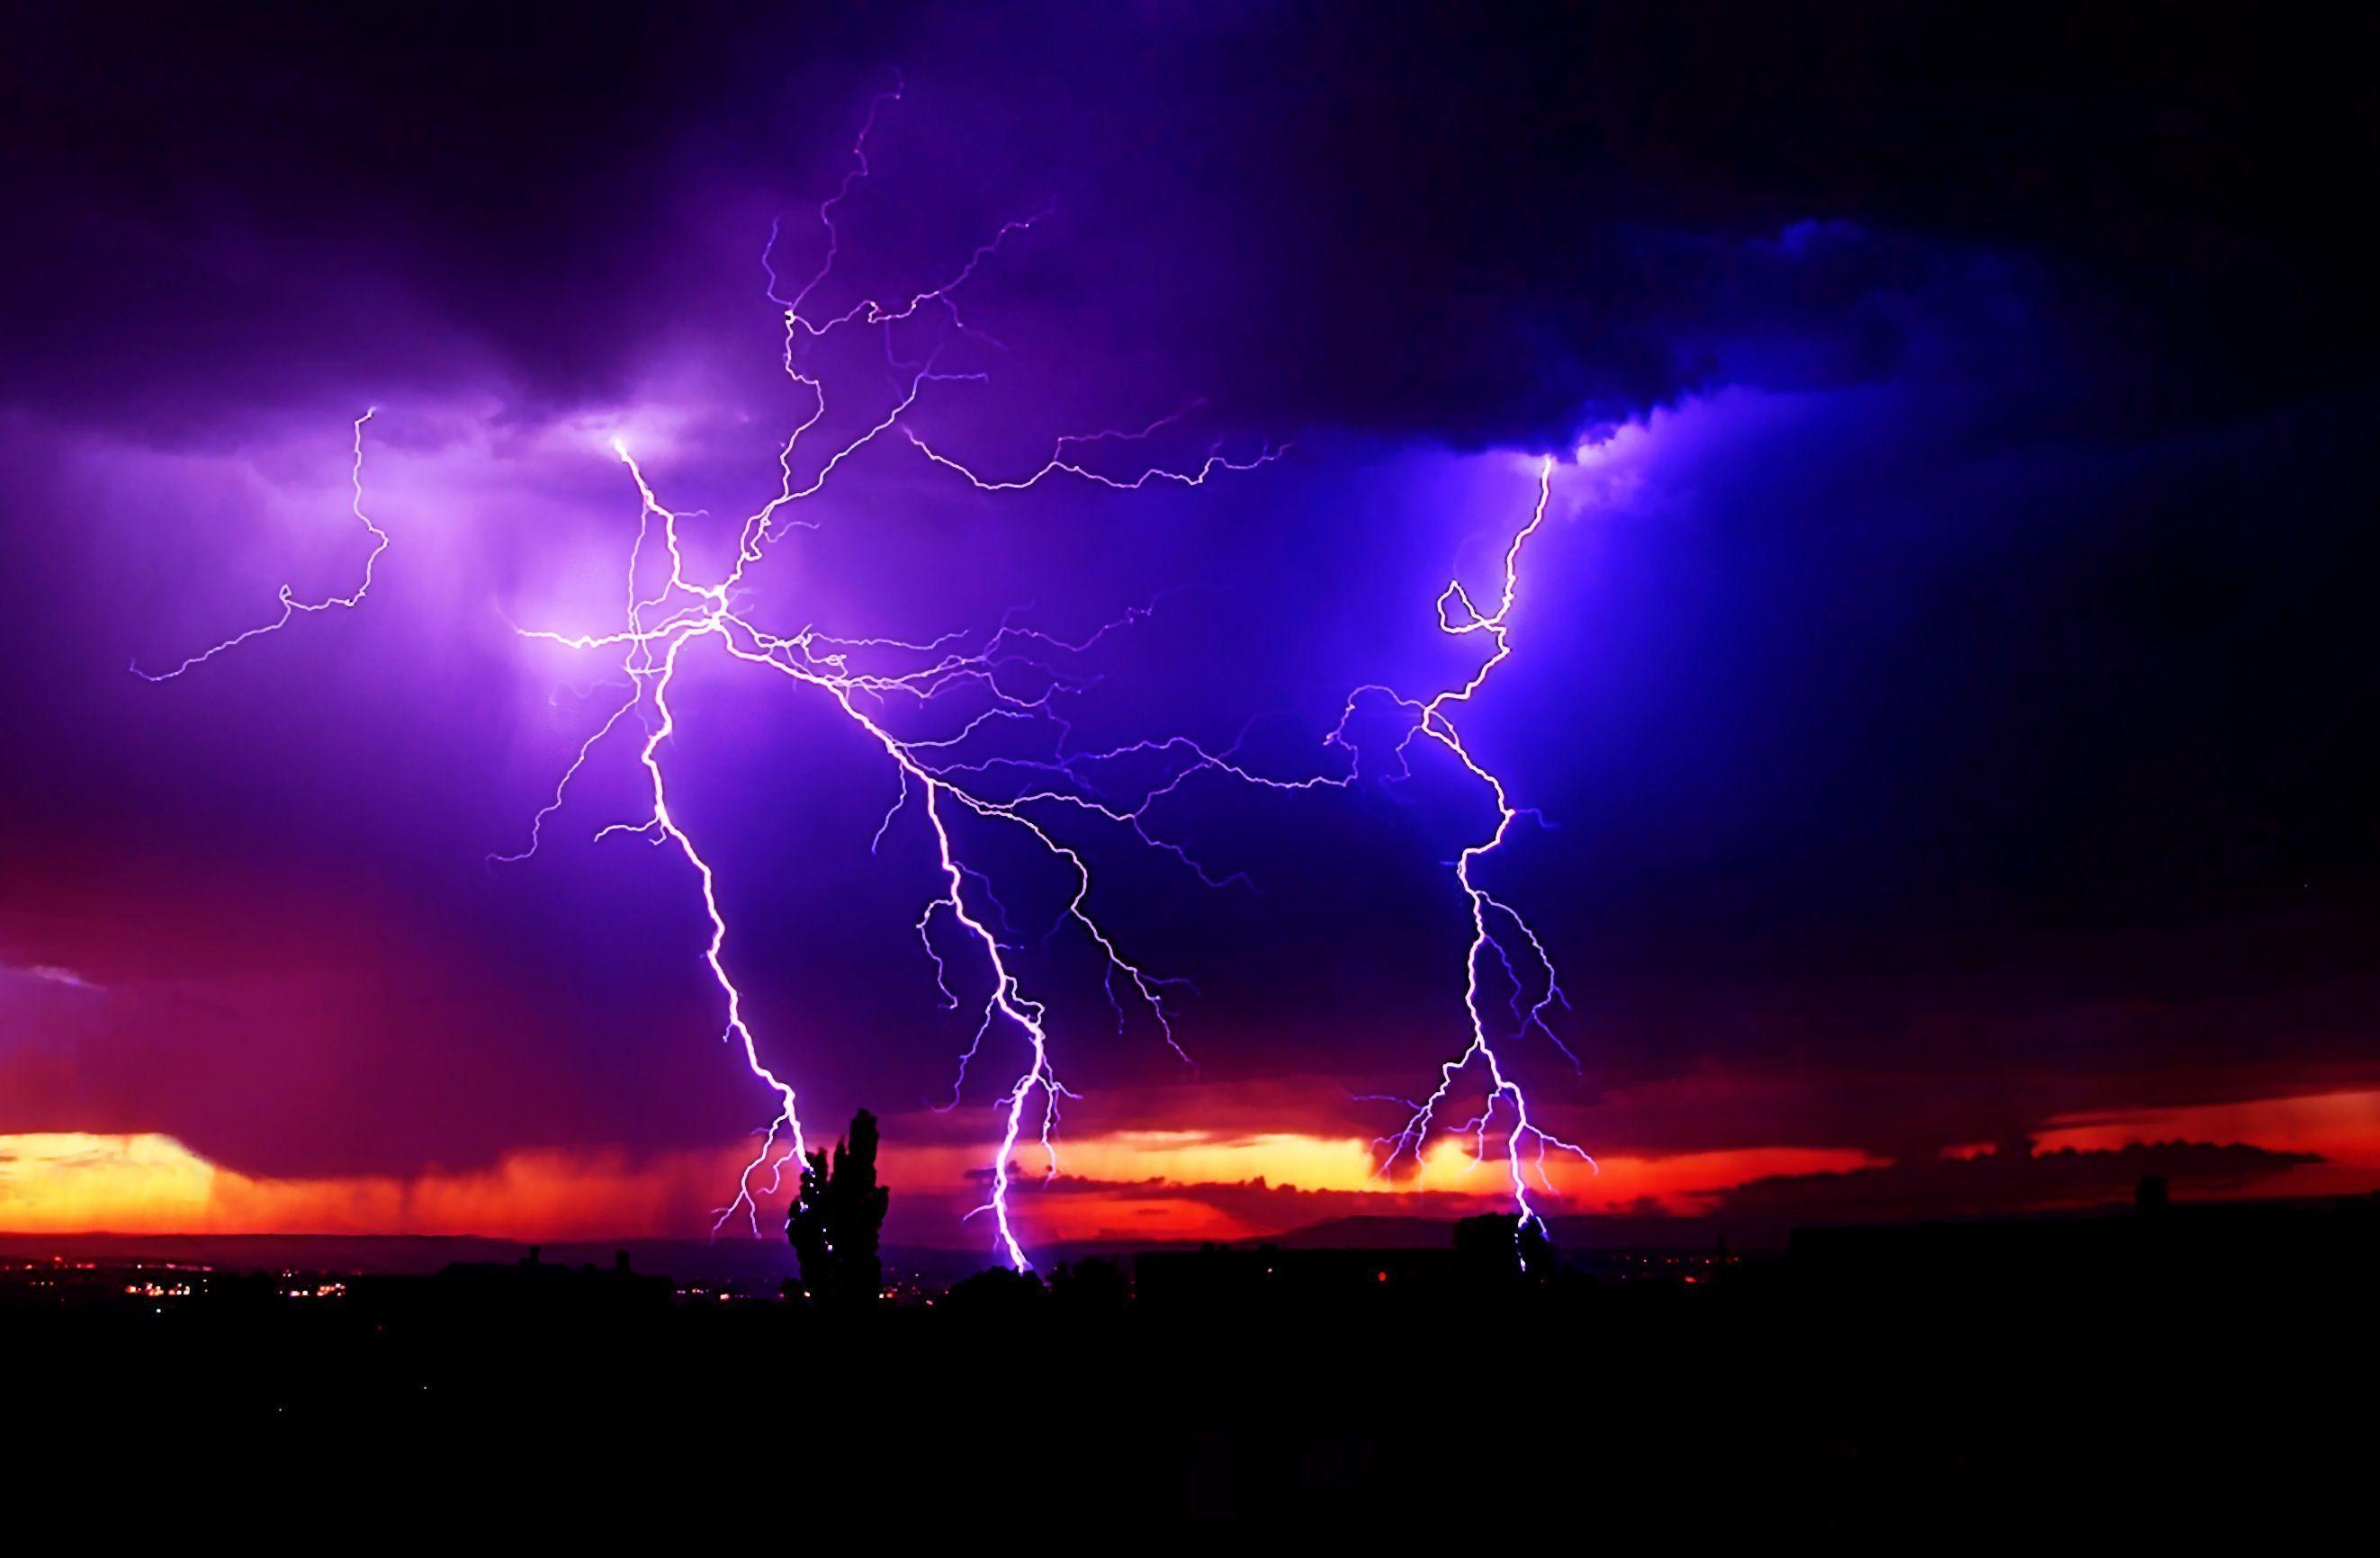 Impressive Lightning Storms for your Desktop Wallpaper | Thomas .